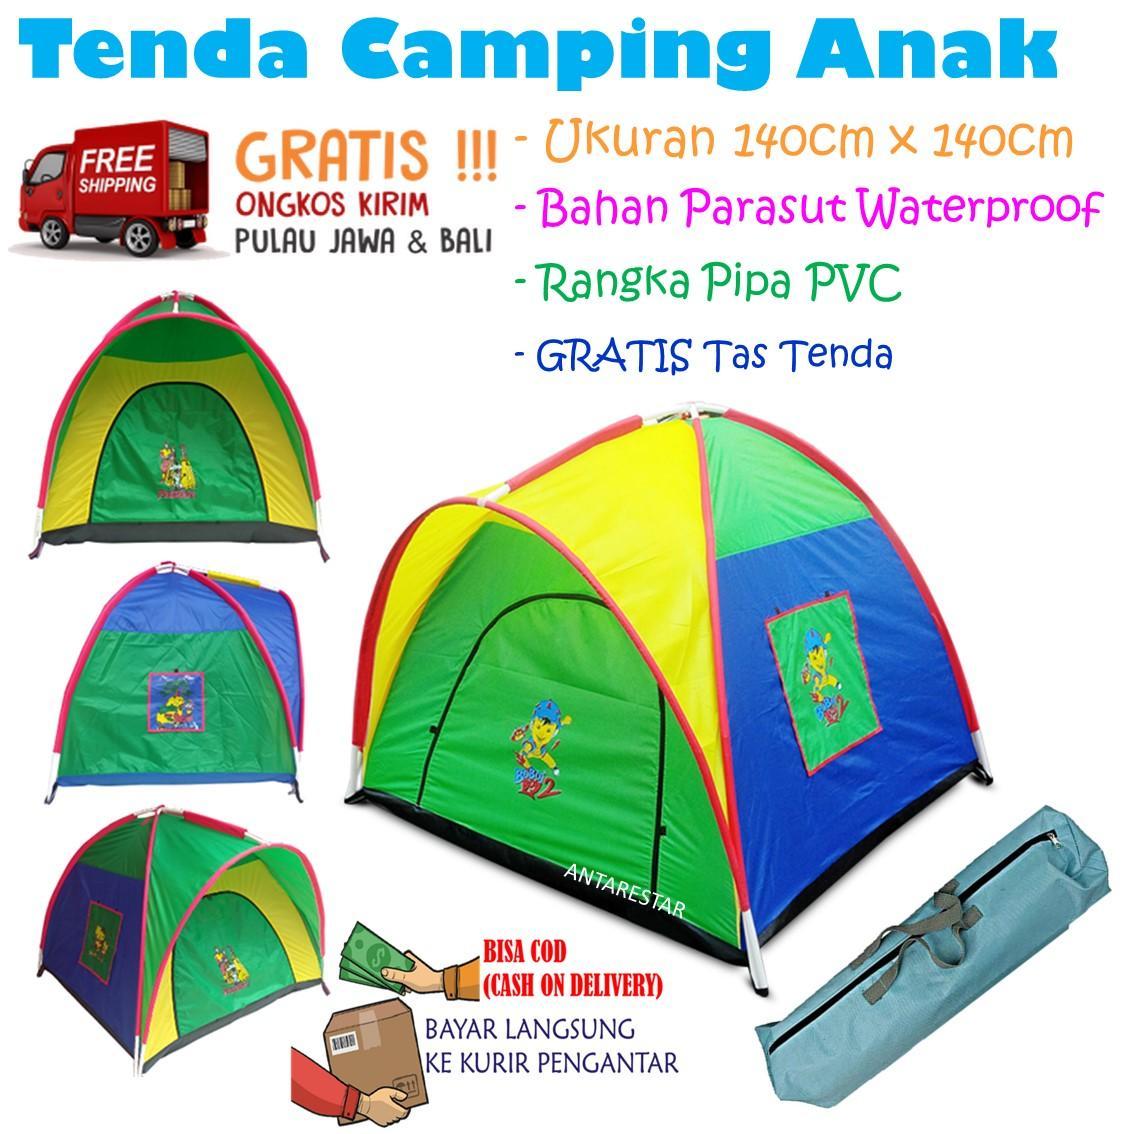 Tenda Anak 140 cm x 140 cm Ukuran Sedang Besar Kemah Camping Mainan